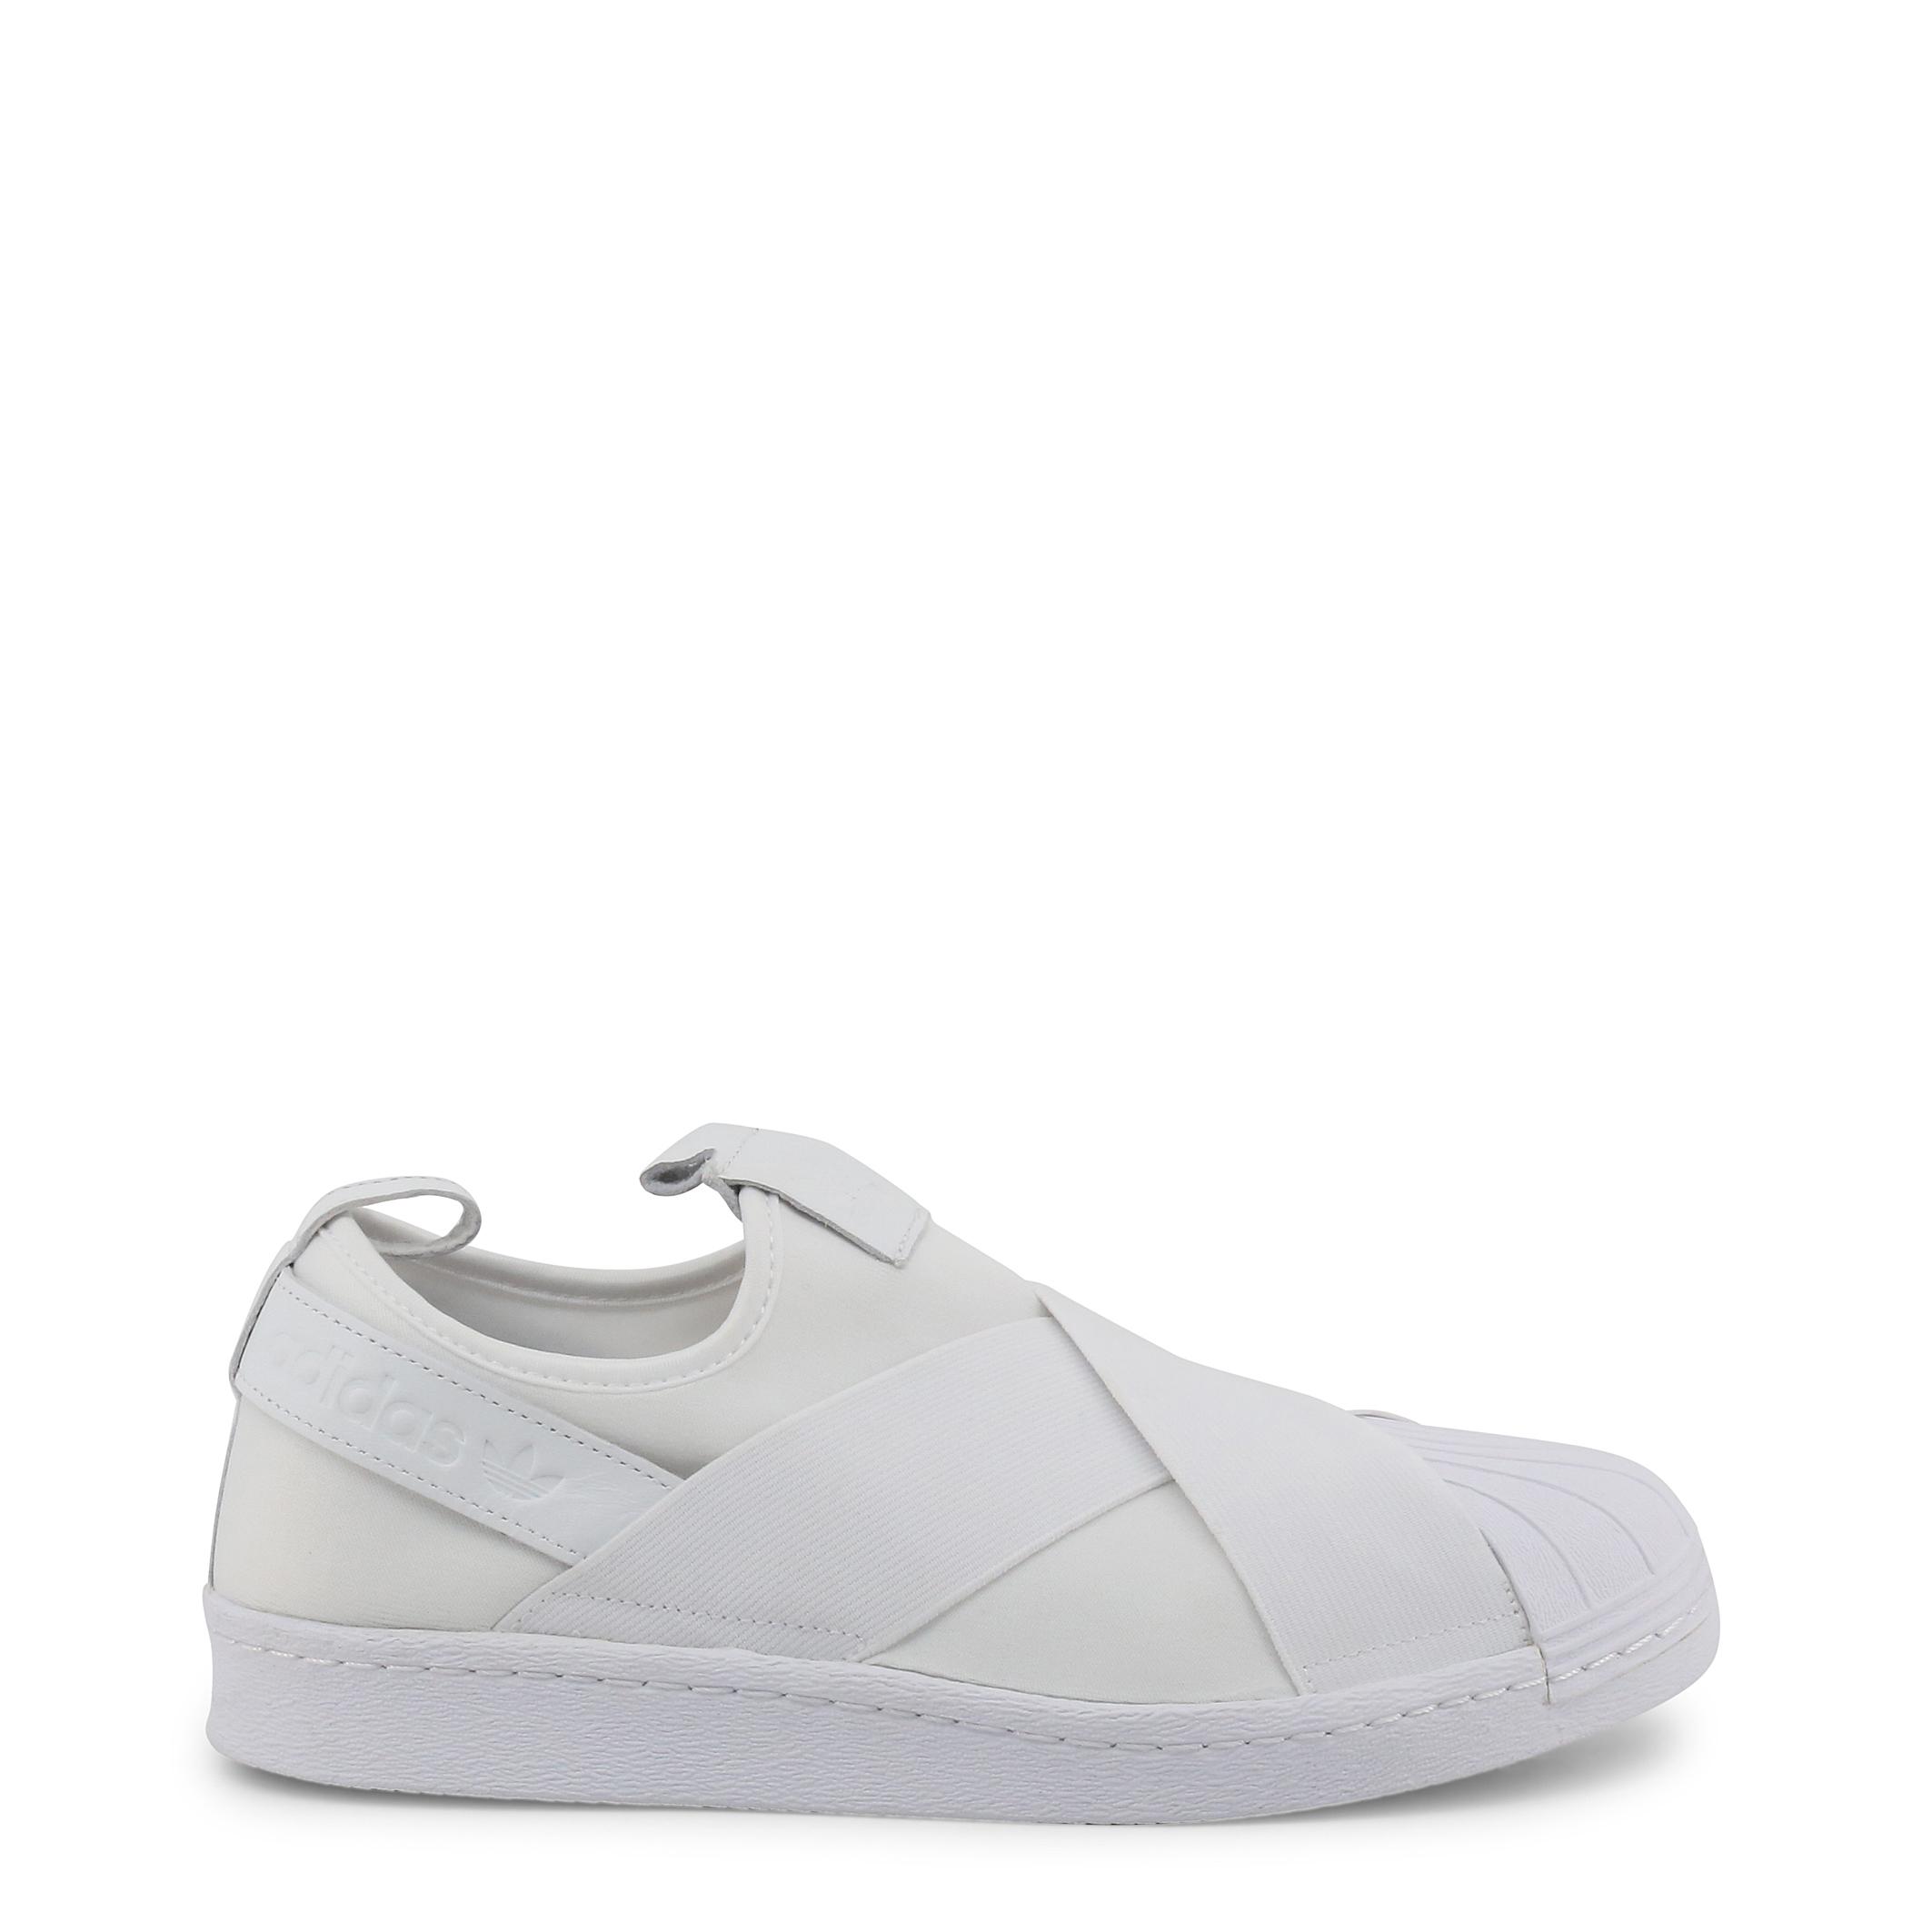 Adidas Superstar-Slipon